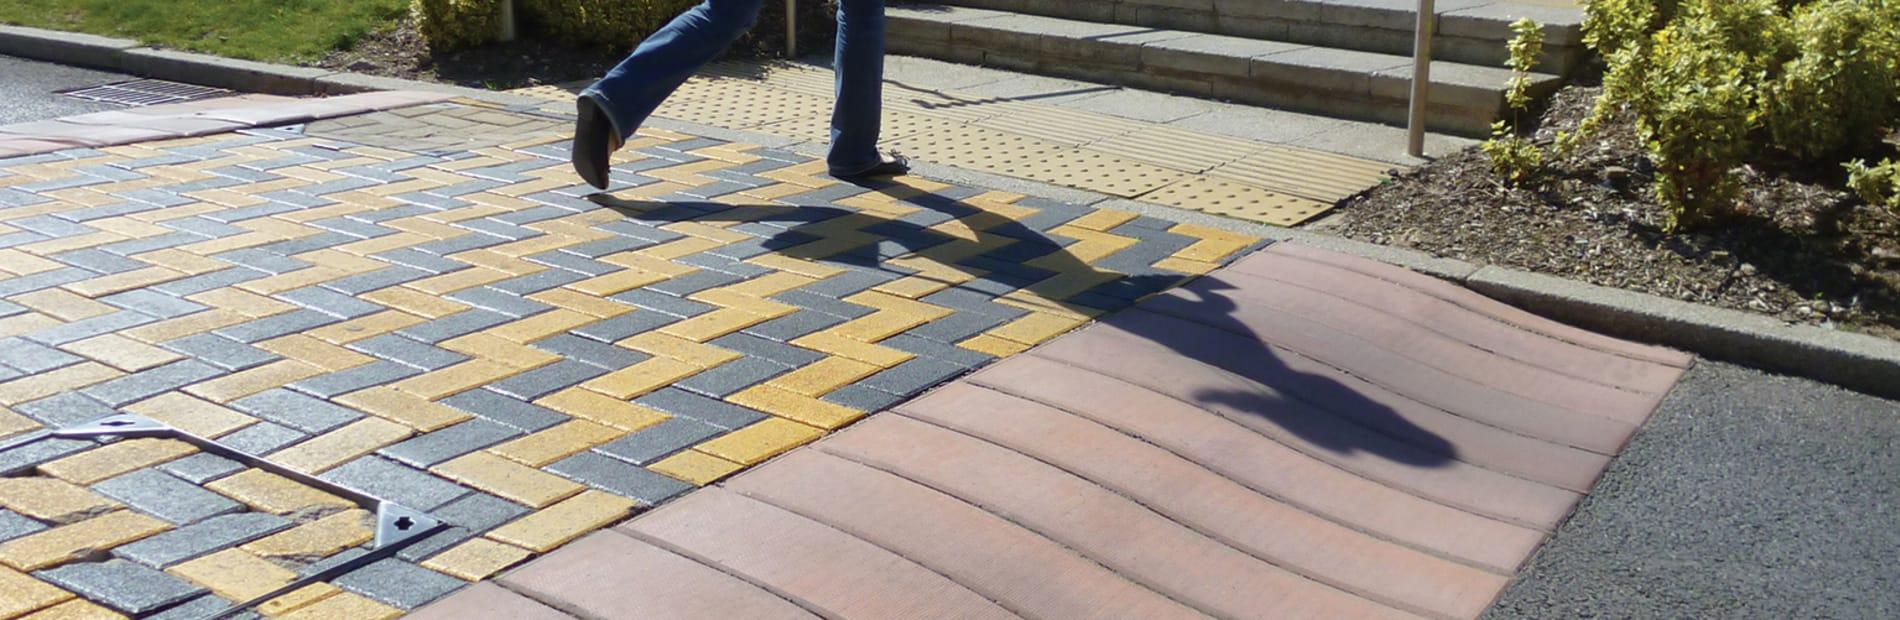 A woman walking across the S ramp reinforced concrete ramp system.